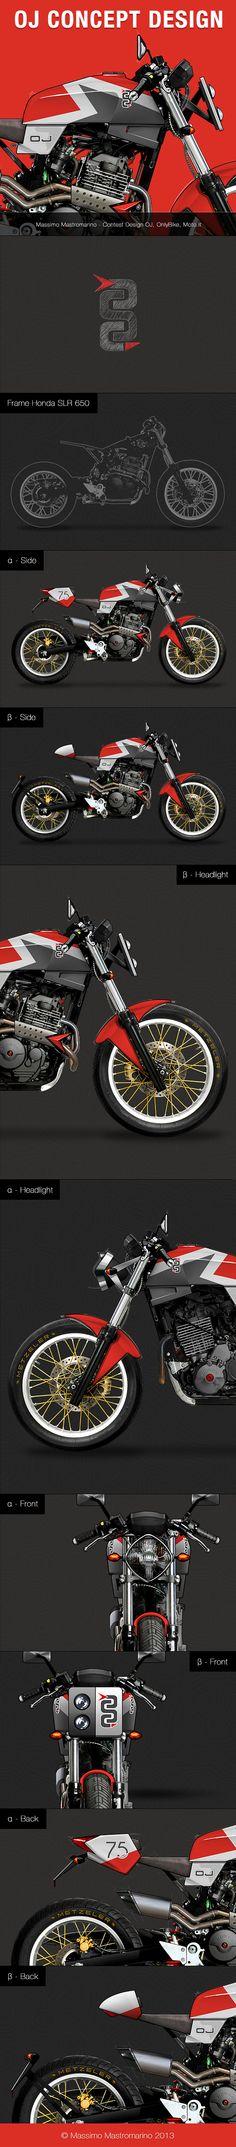 Concept Design Moto - OJ on Behance